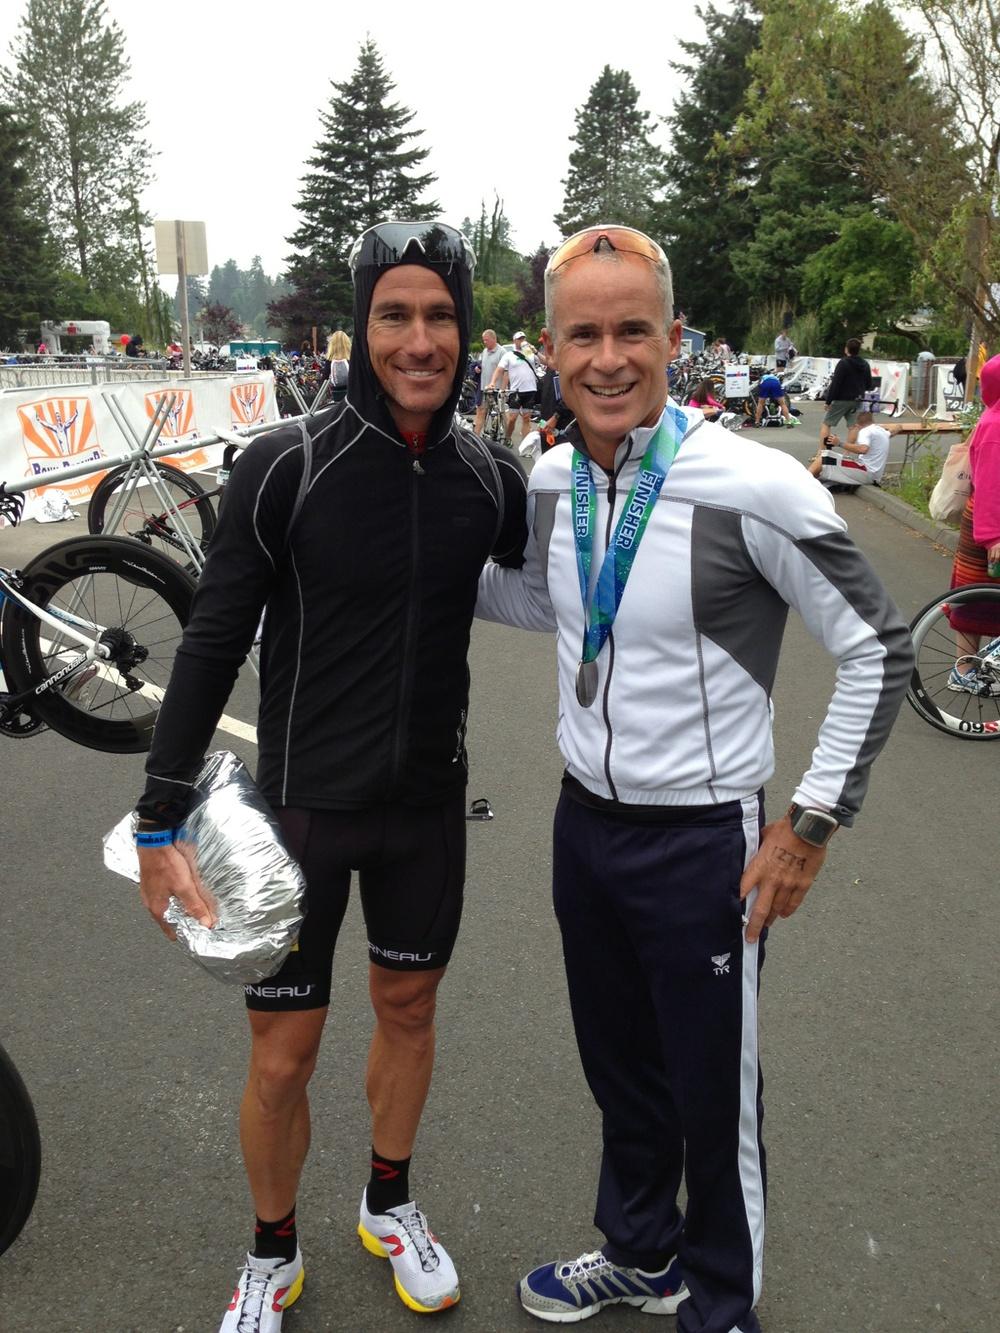 Jason Fitzhugh with World Champion Craig Alexander